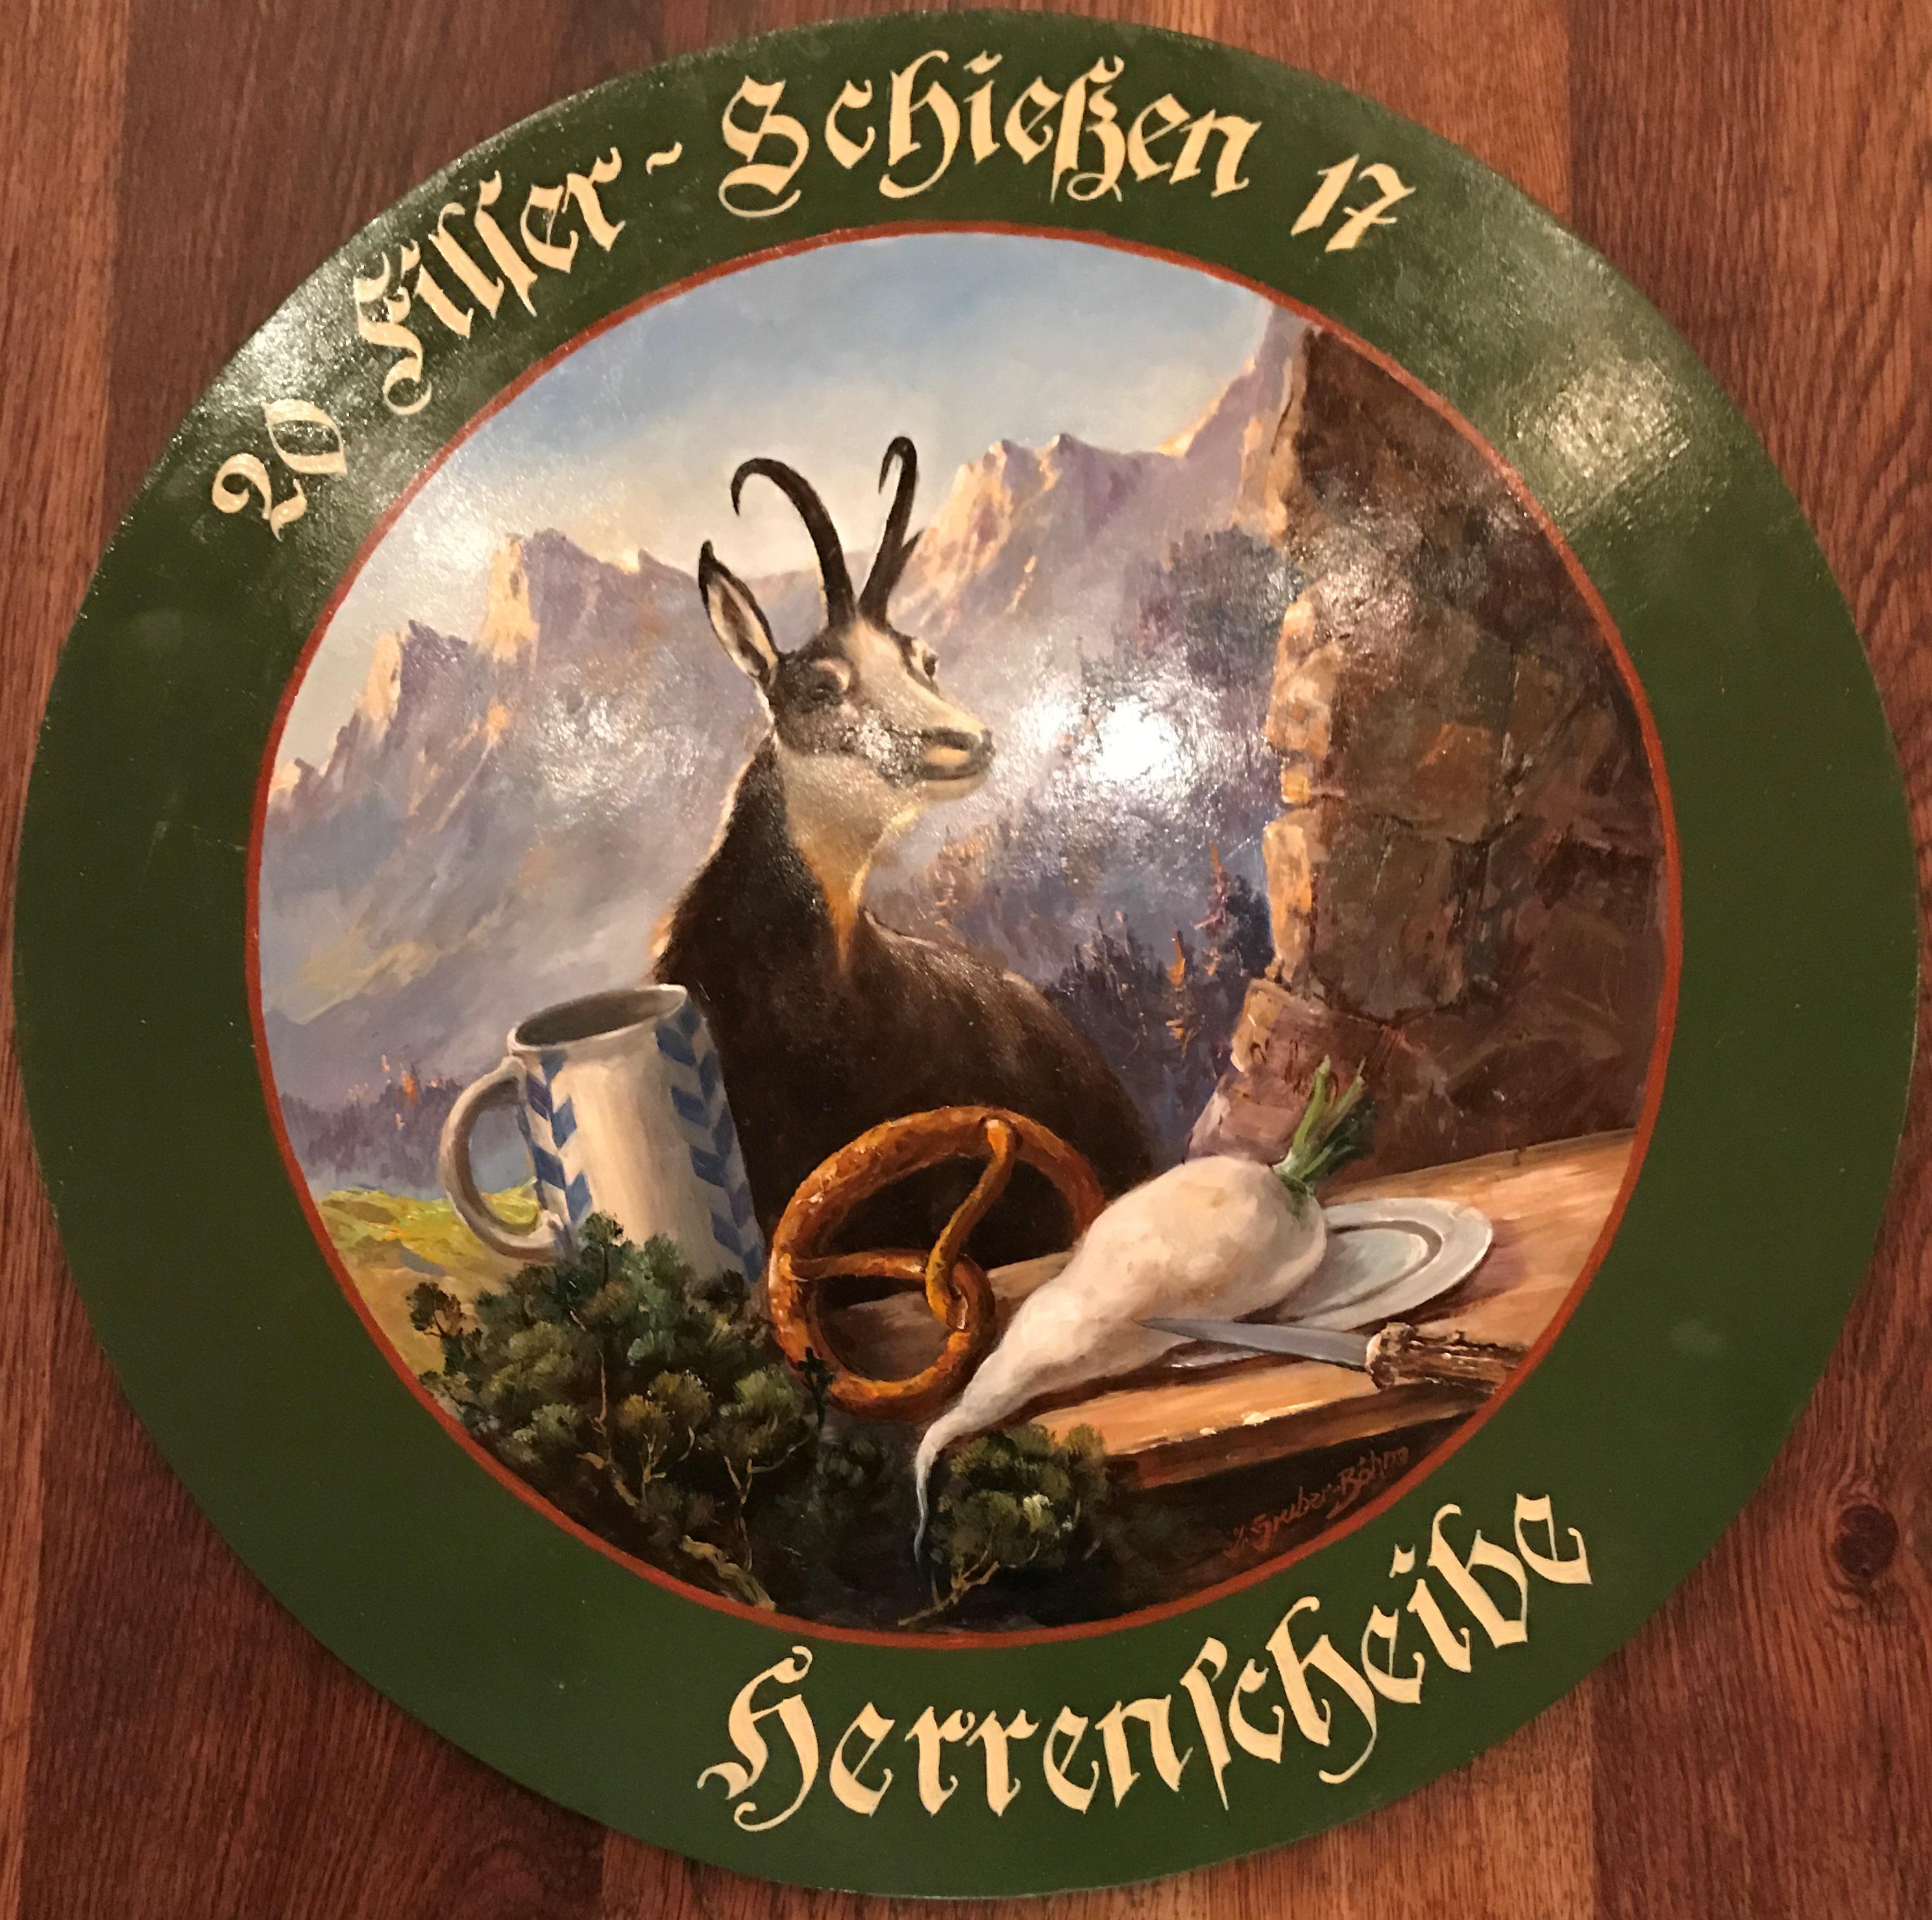 Filser-Schießen 2017